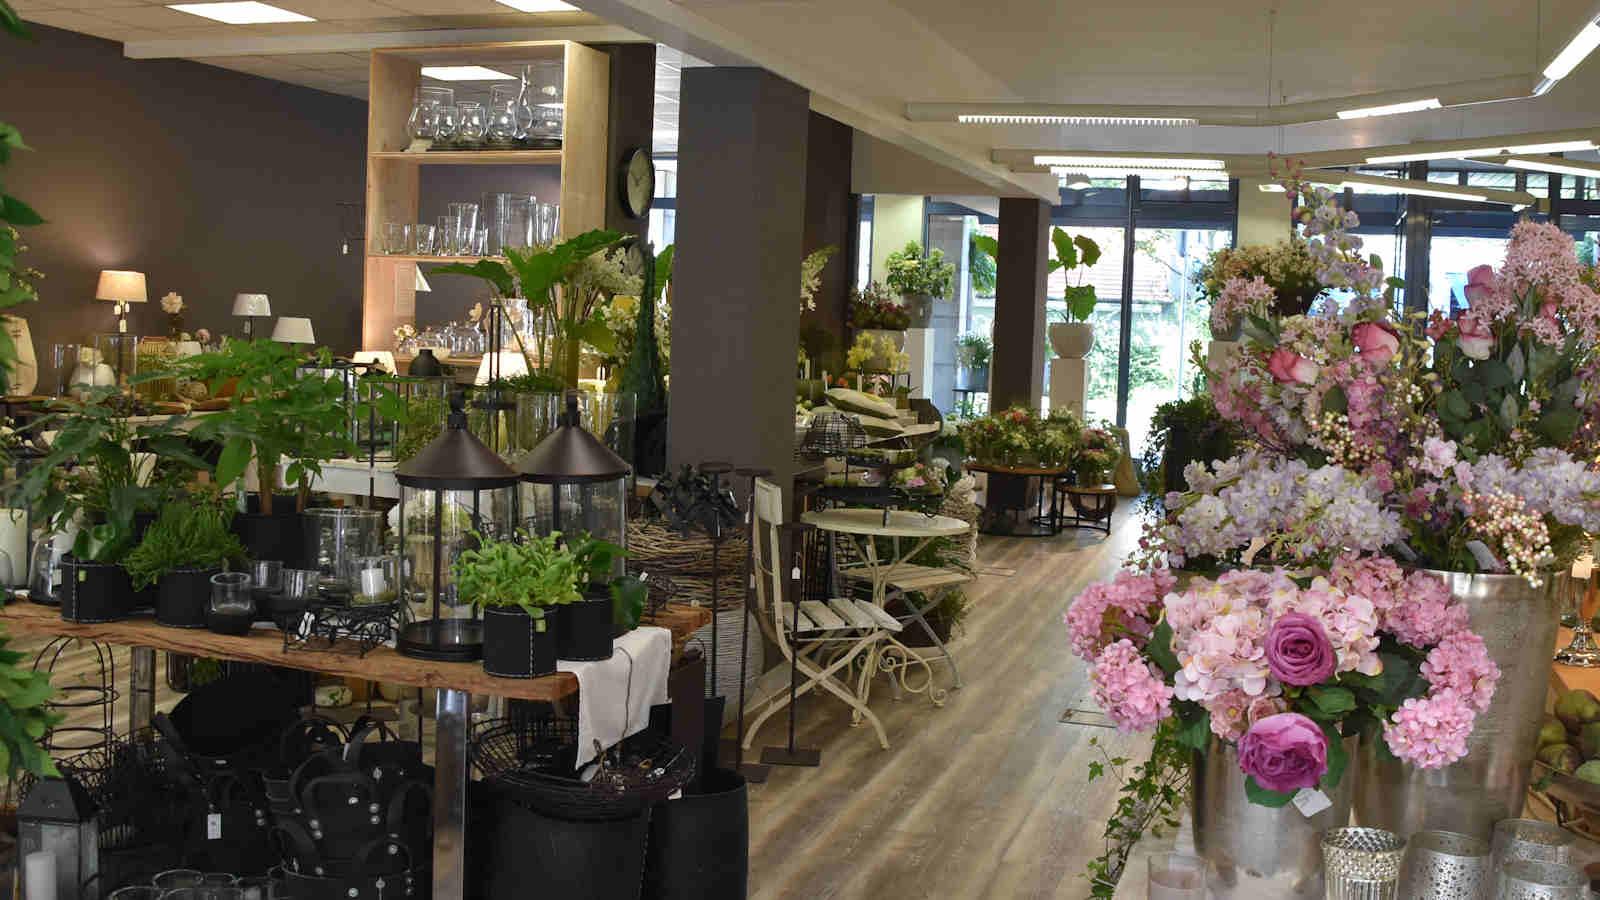 Blumen & Ambiente in der Lederstraße 102 in Reutlingen